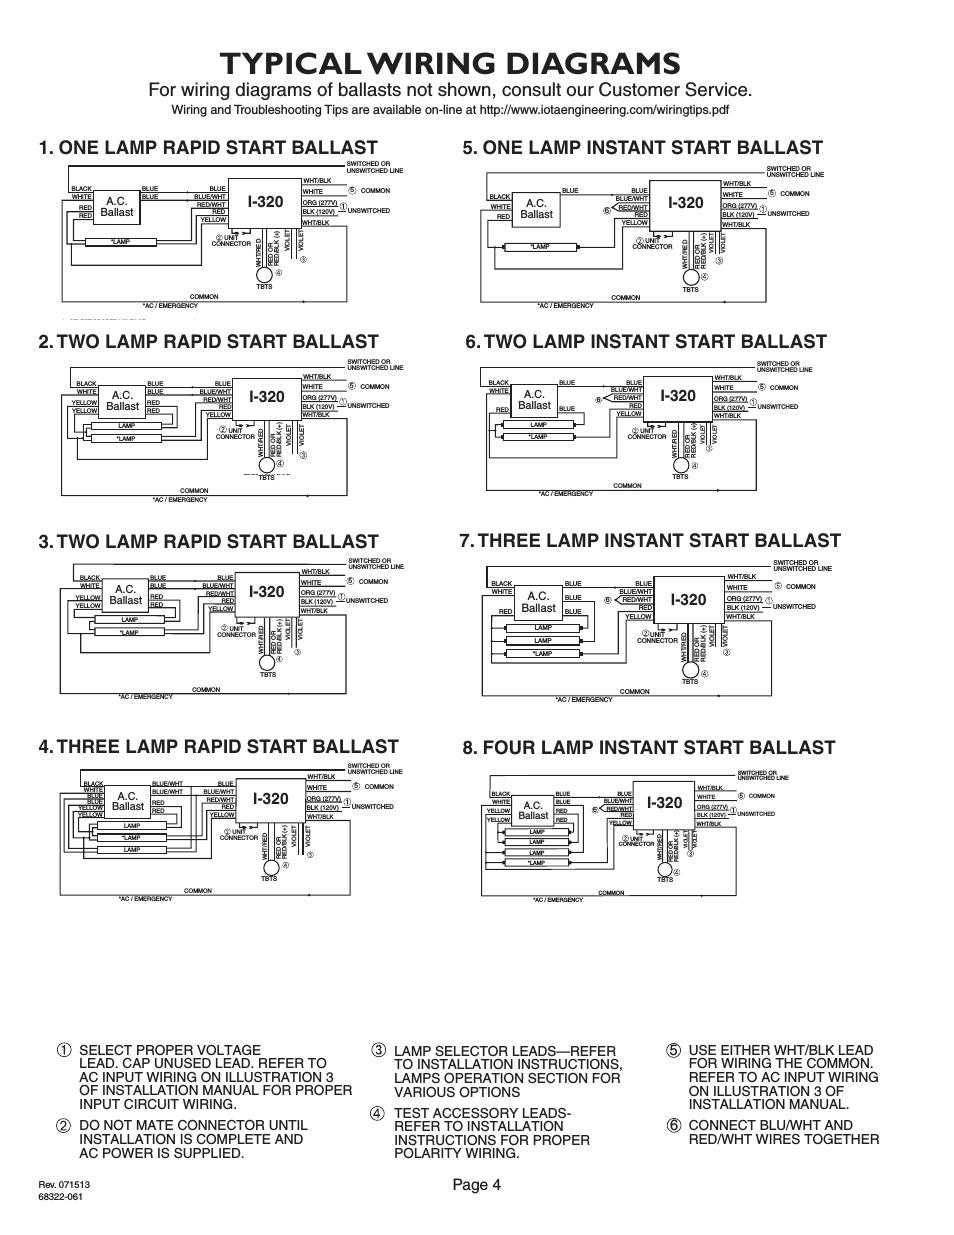 Iota Emergency Ballast Wiring Diagram - 7.8.depo-aqua.de •